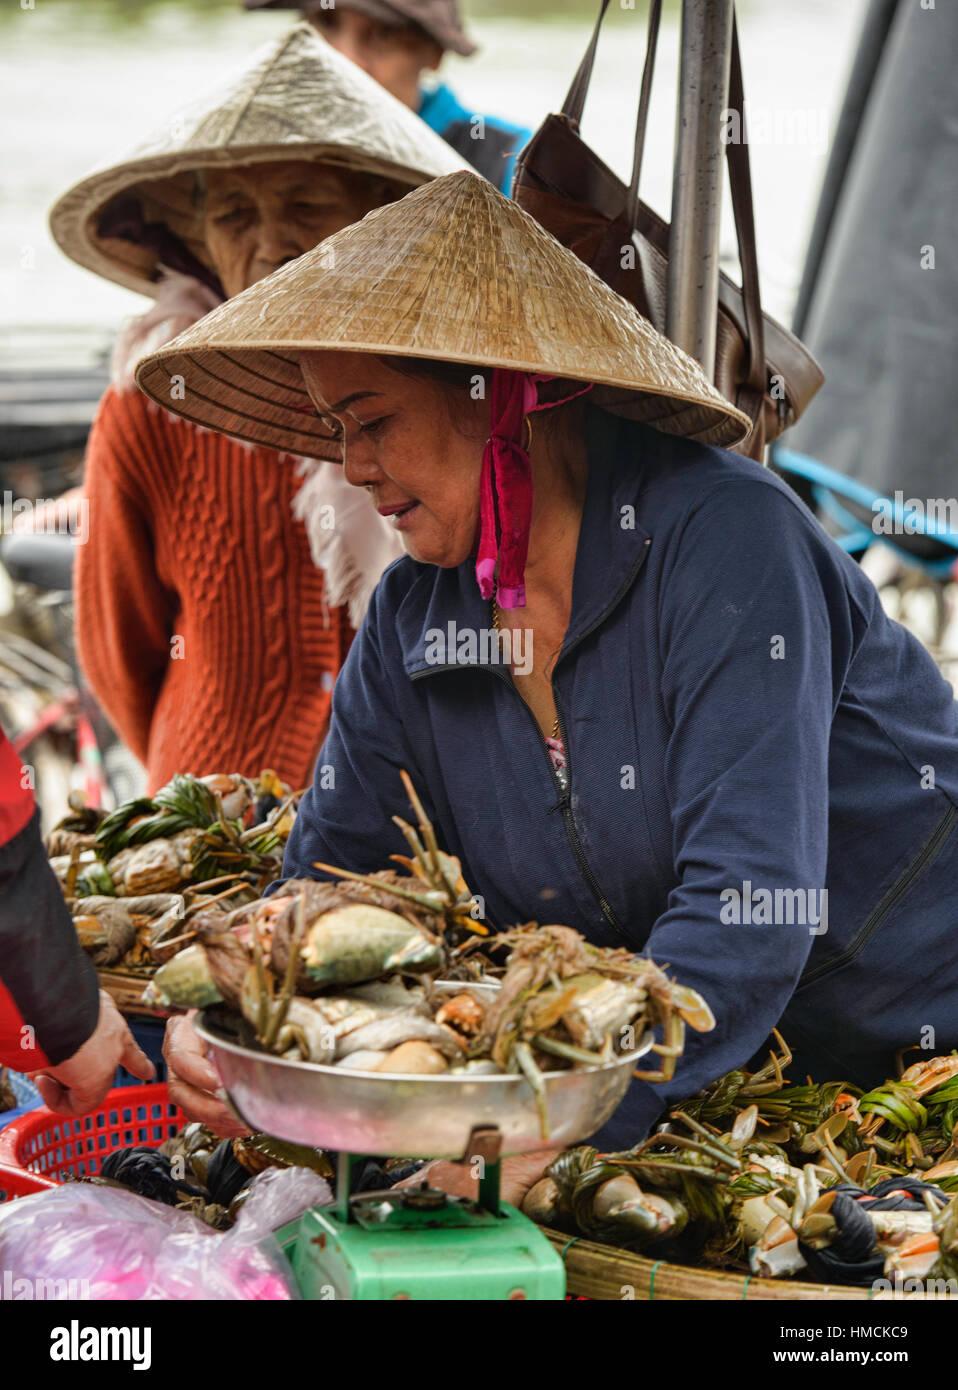 Crab vendor in the fish market, Hoi An, Vietnam - Stock Image